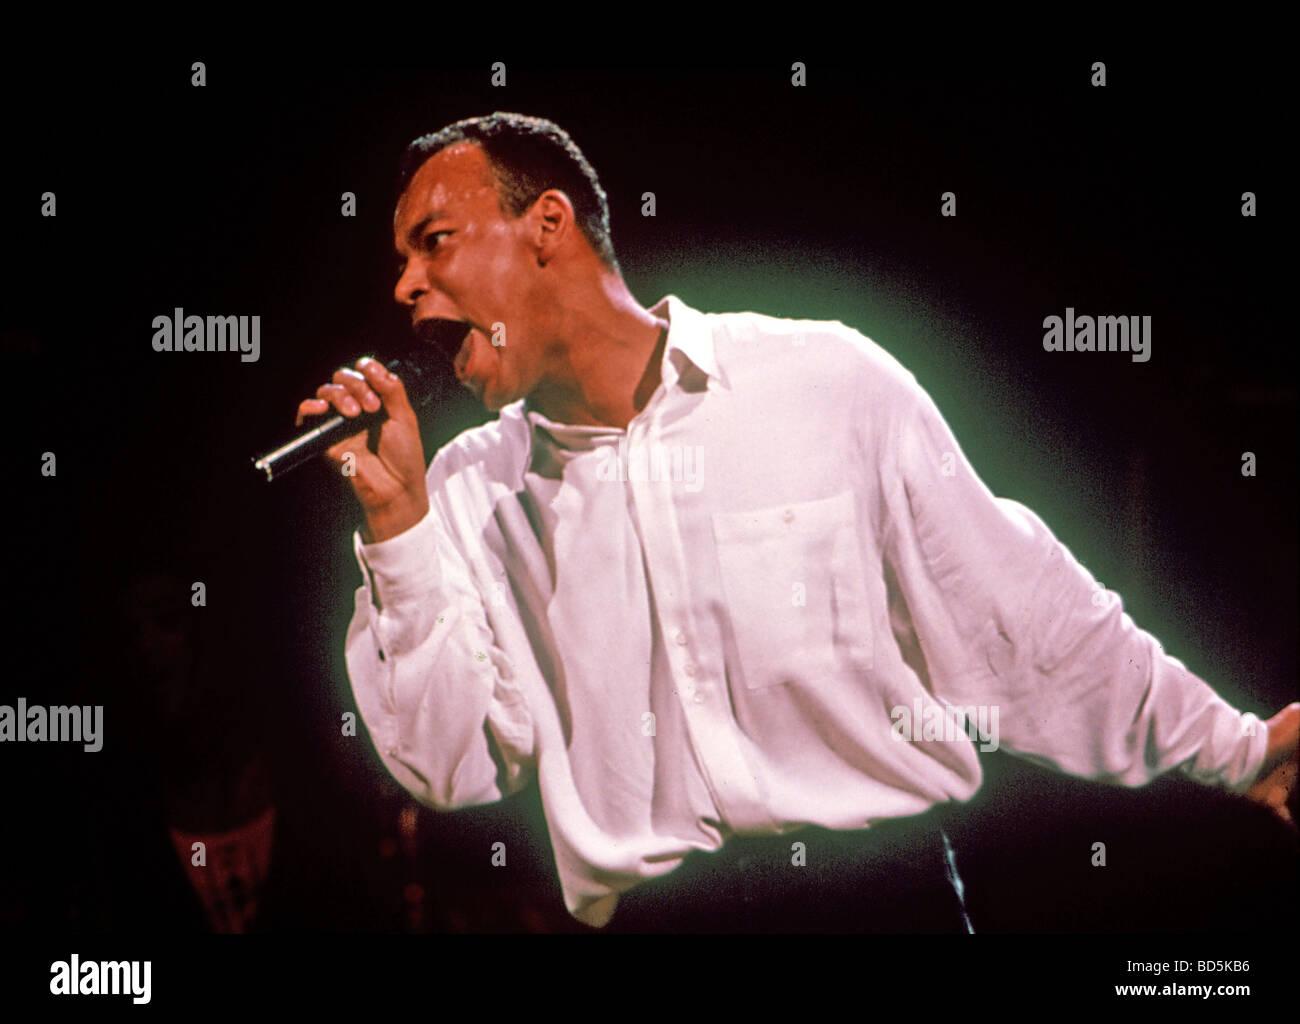 ROLAND GIFT-Sänger mit den Fine Young Cannibals-pop-Gruppe über 1989 Stockbild